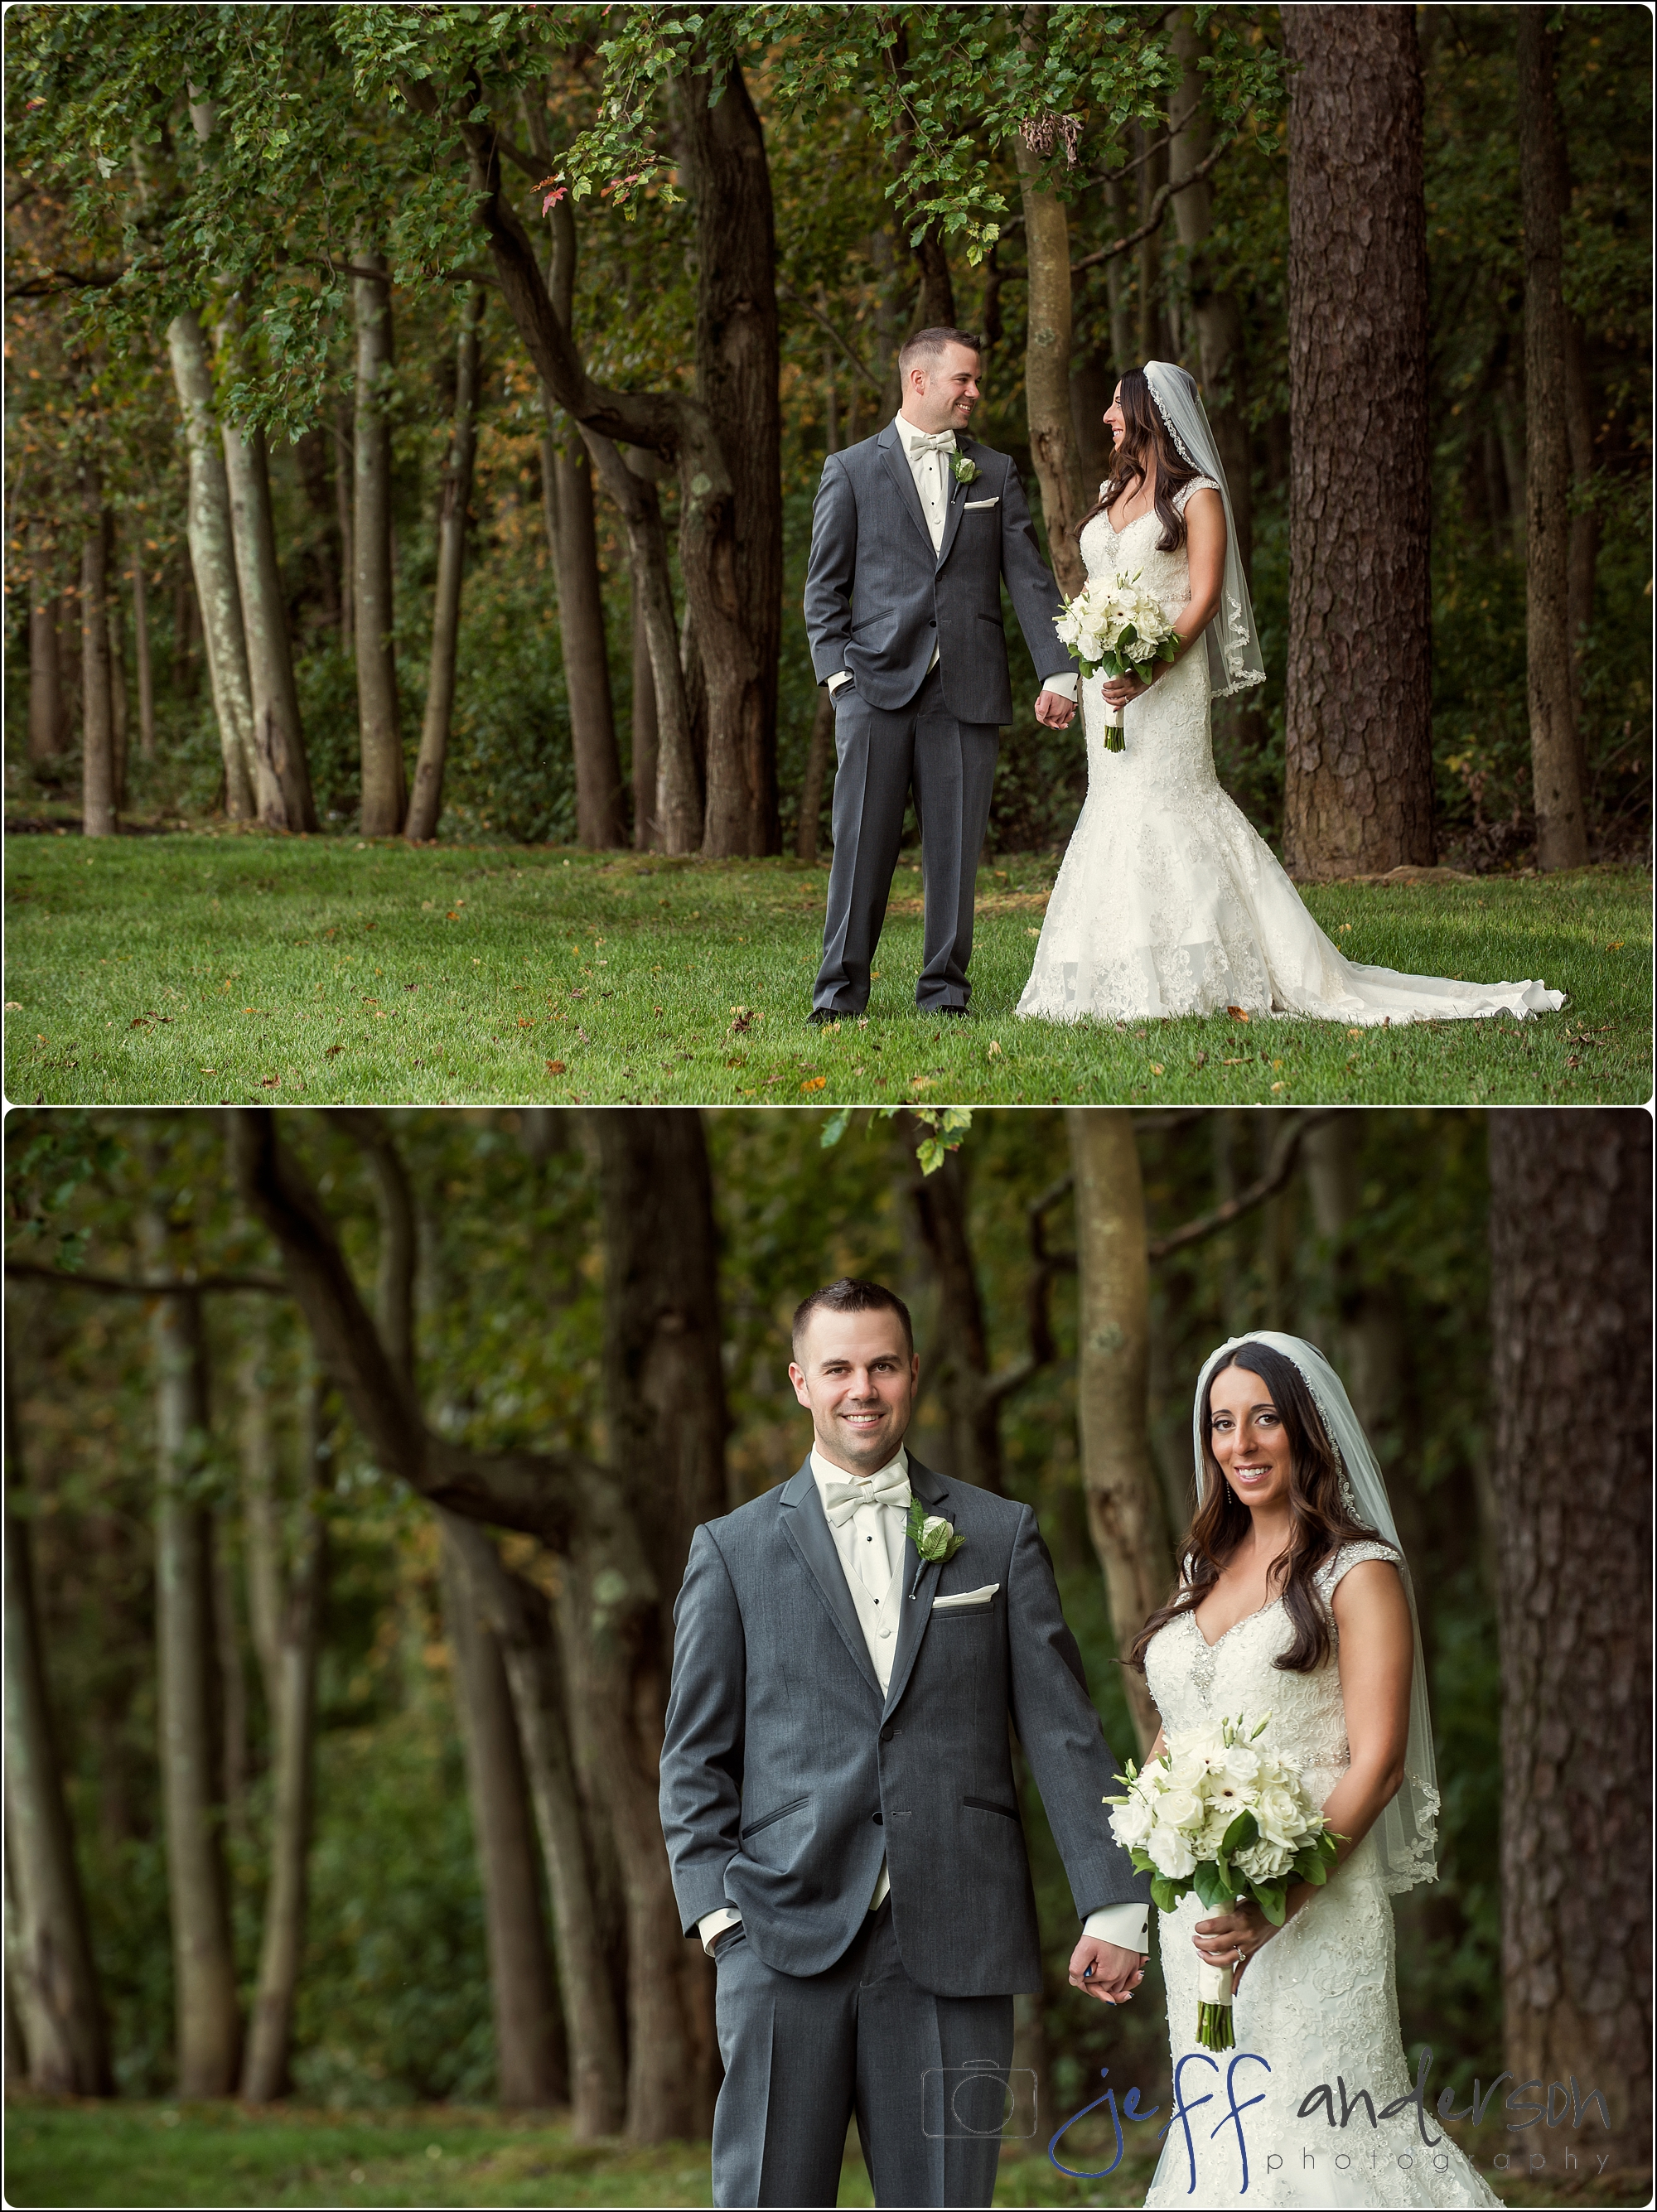 alliance video,brigalia's,deidre & matt,destination wedding photographer,jeff anderson photography,philadelphia wedding photographer,south jersey wedding photographer,wedding photography,